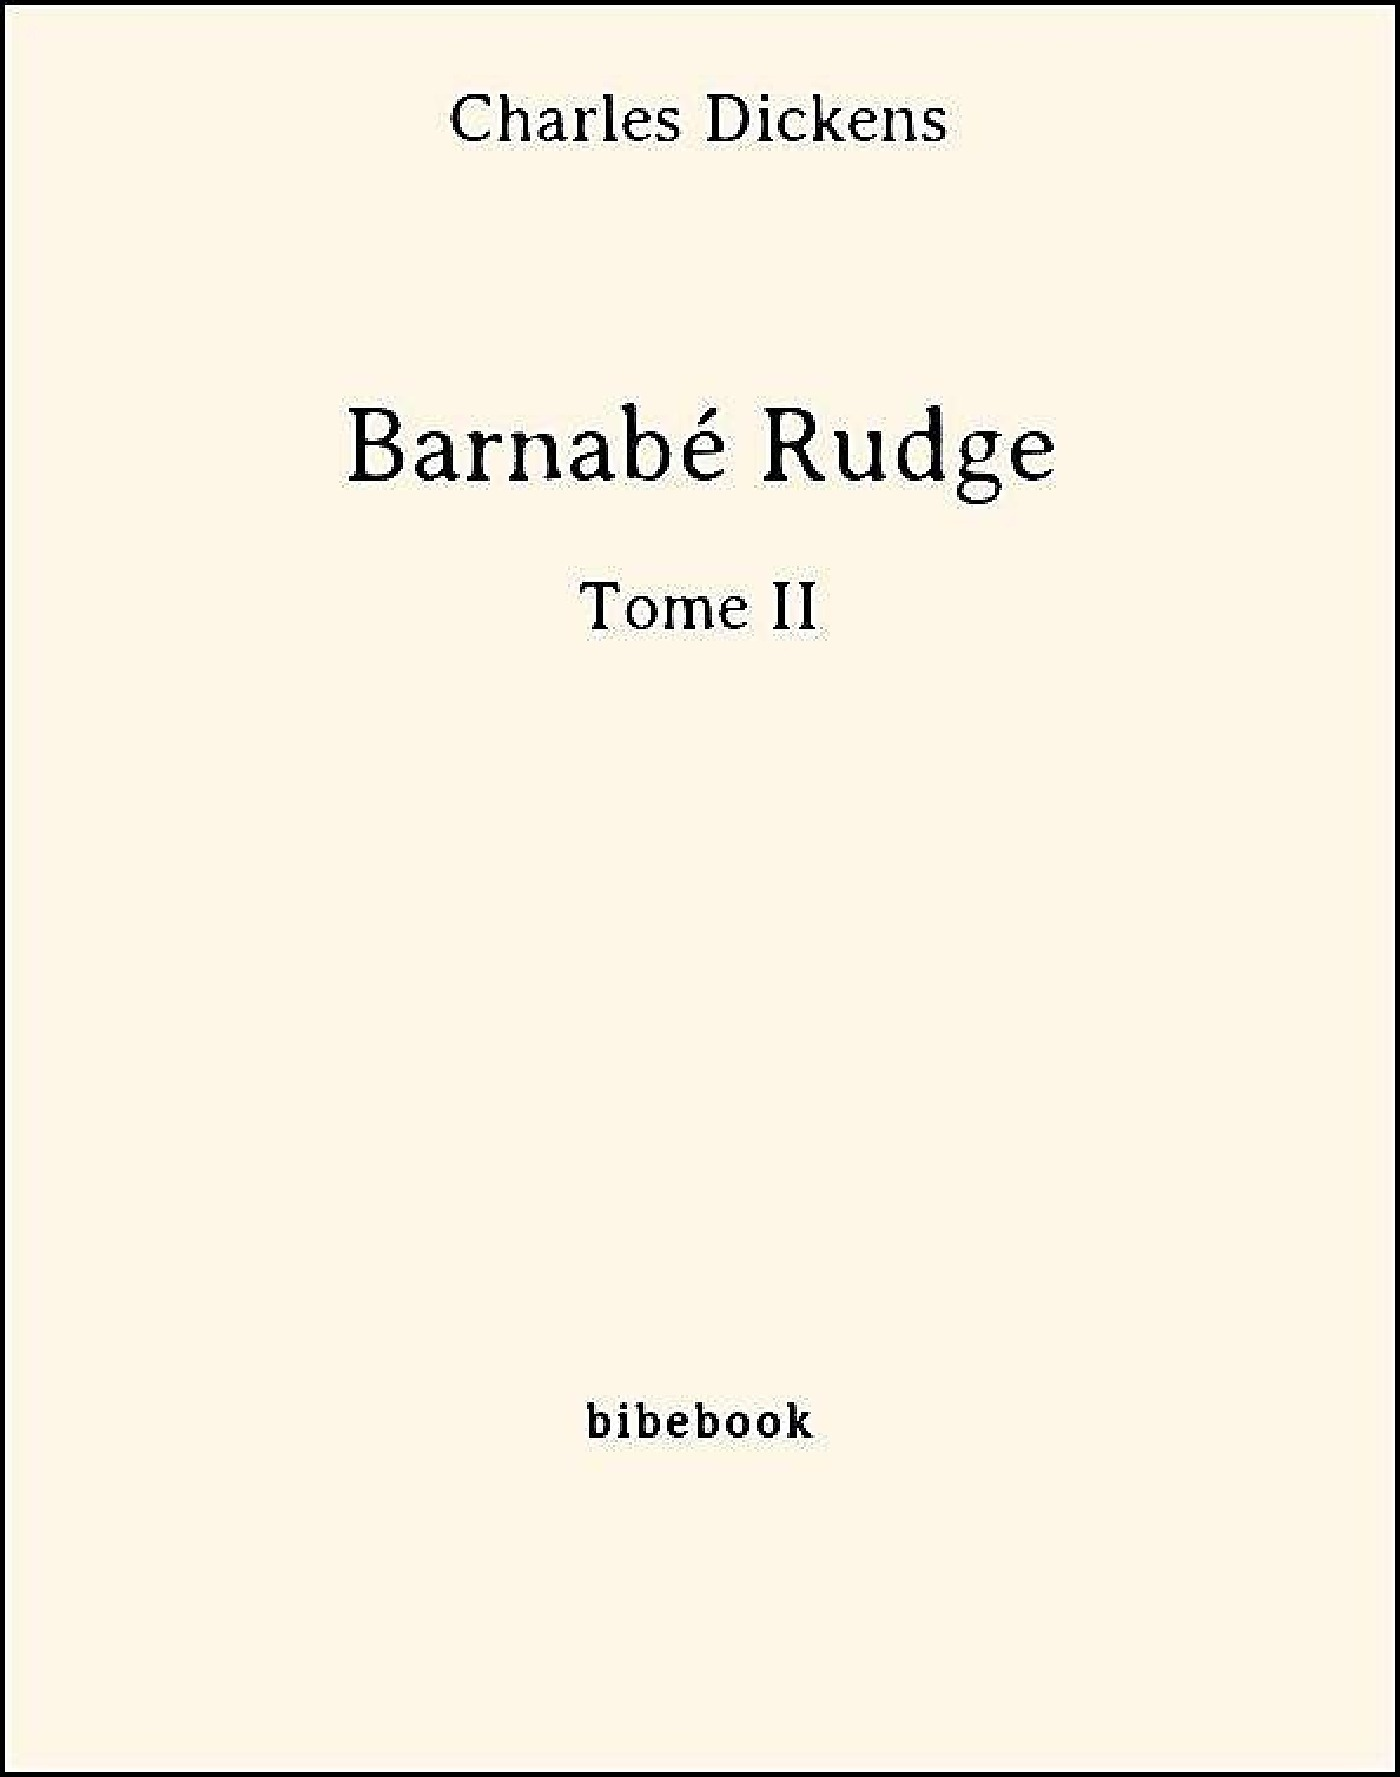 Barnabé Rudge t.2